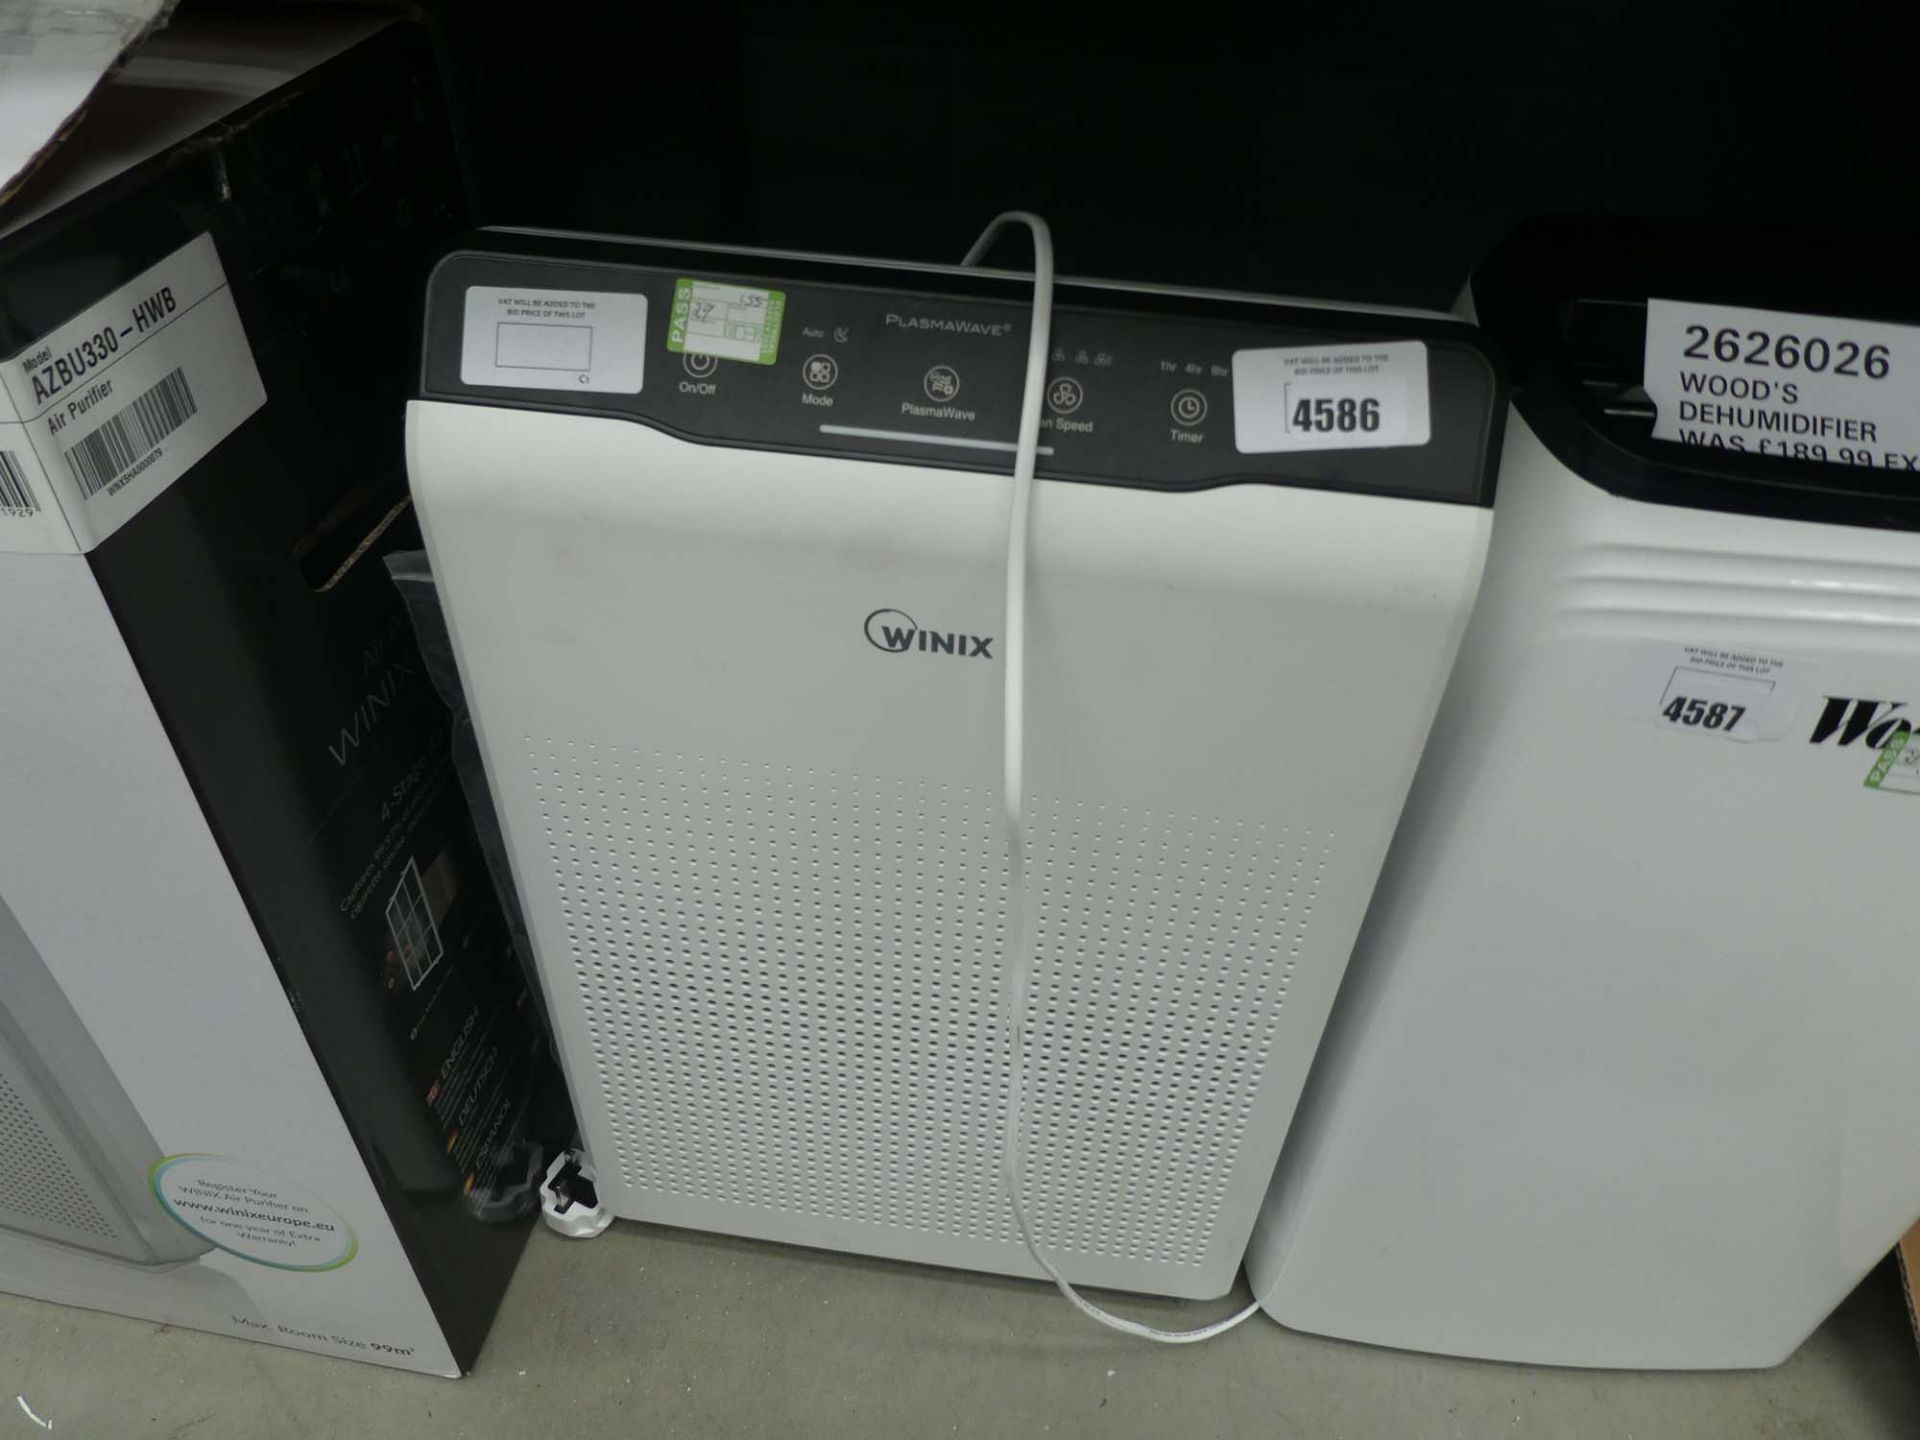 Unboxed winix air purifier